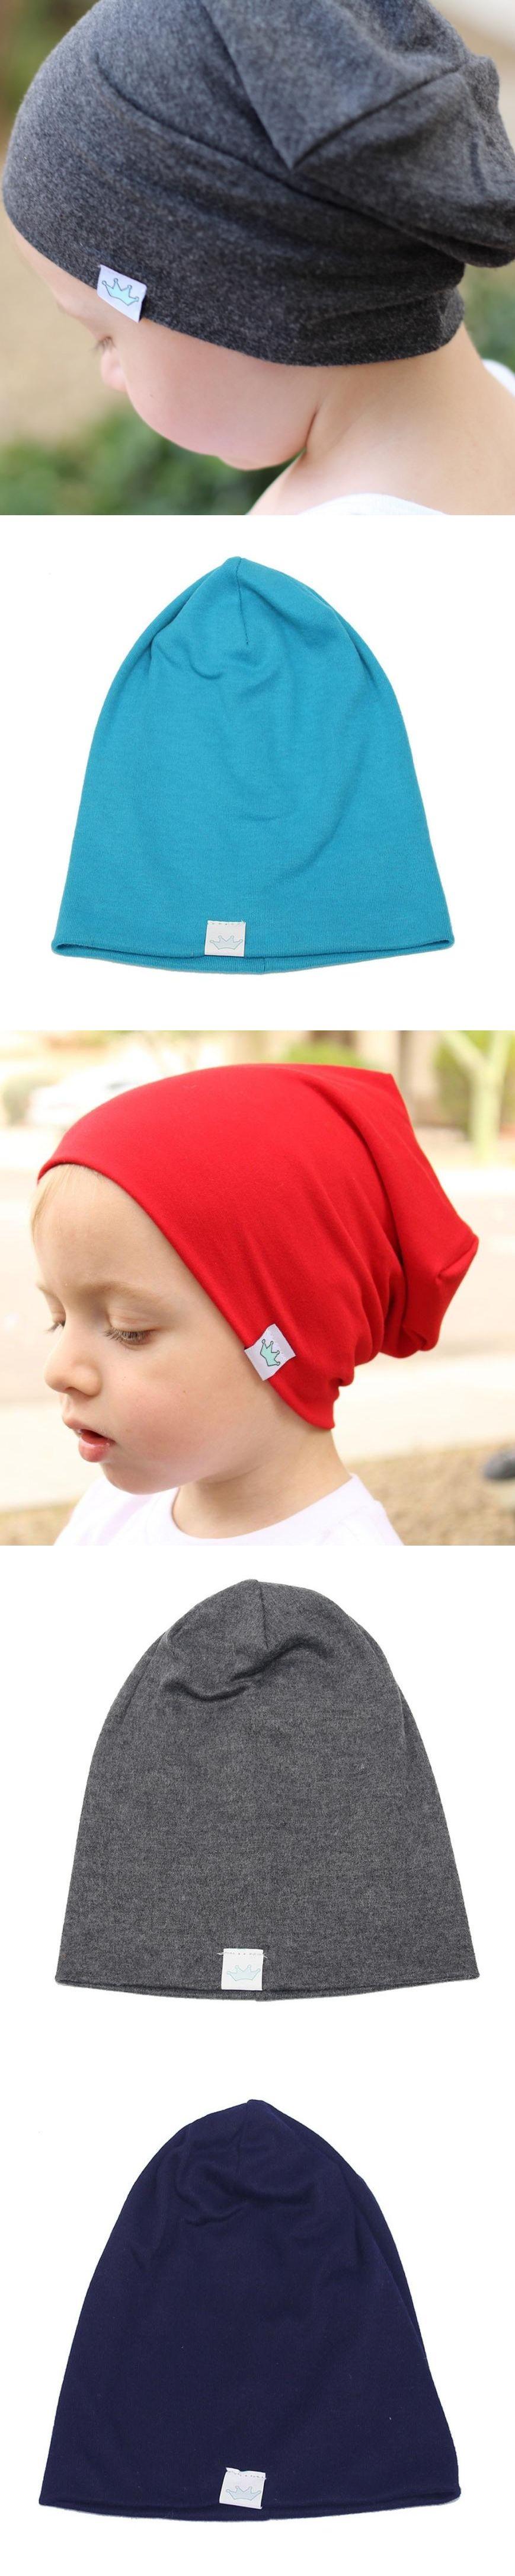 619885f8f83 Solid Baby Winter Hat Bonnet Enfant Kids Baby Boy Girl Infant Cotton Soft  Warm Hat Beanie